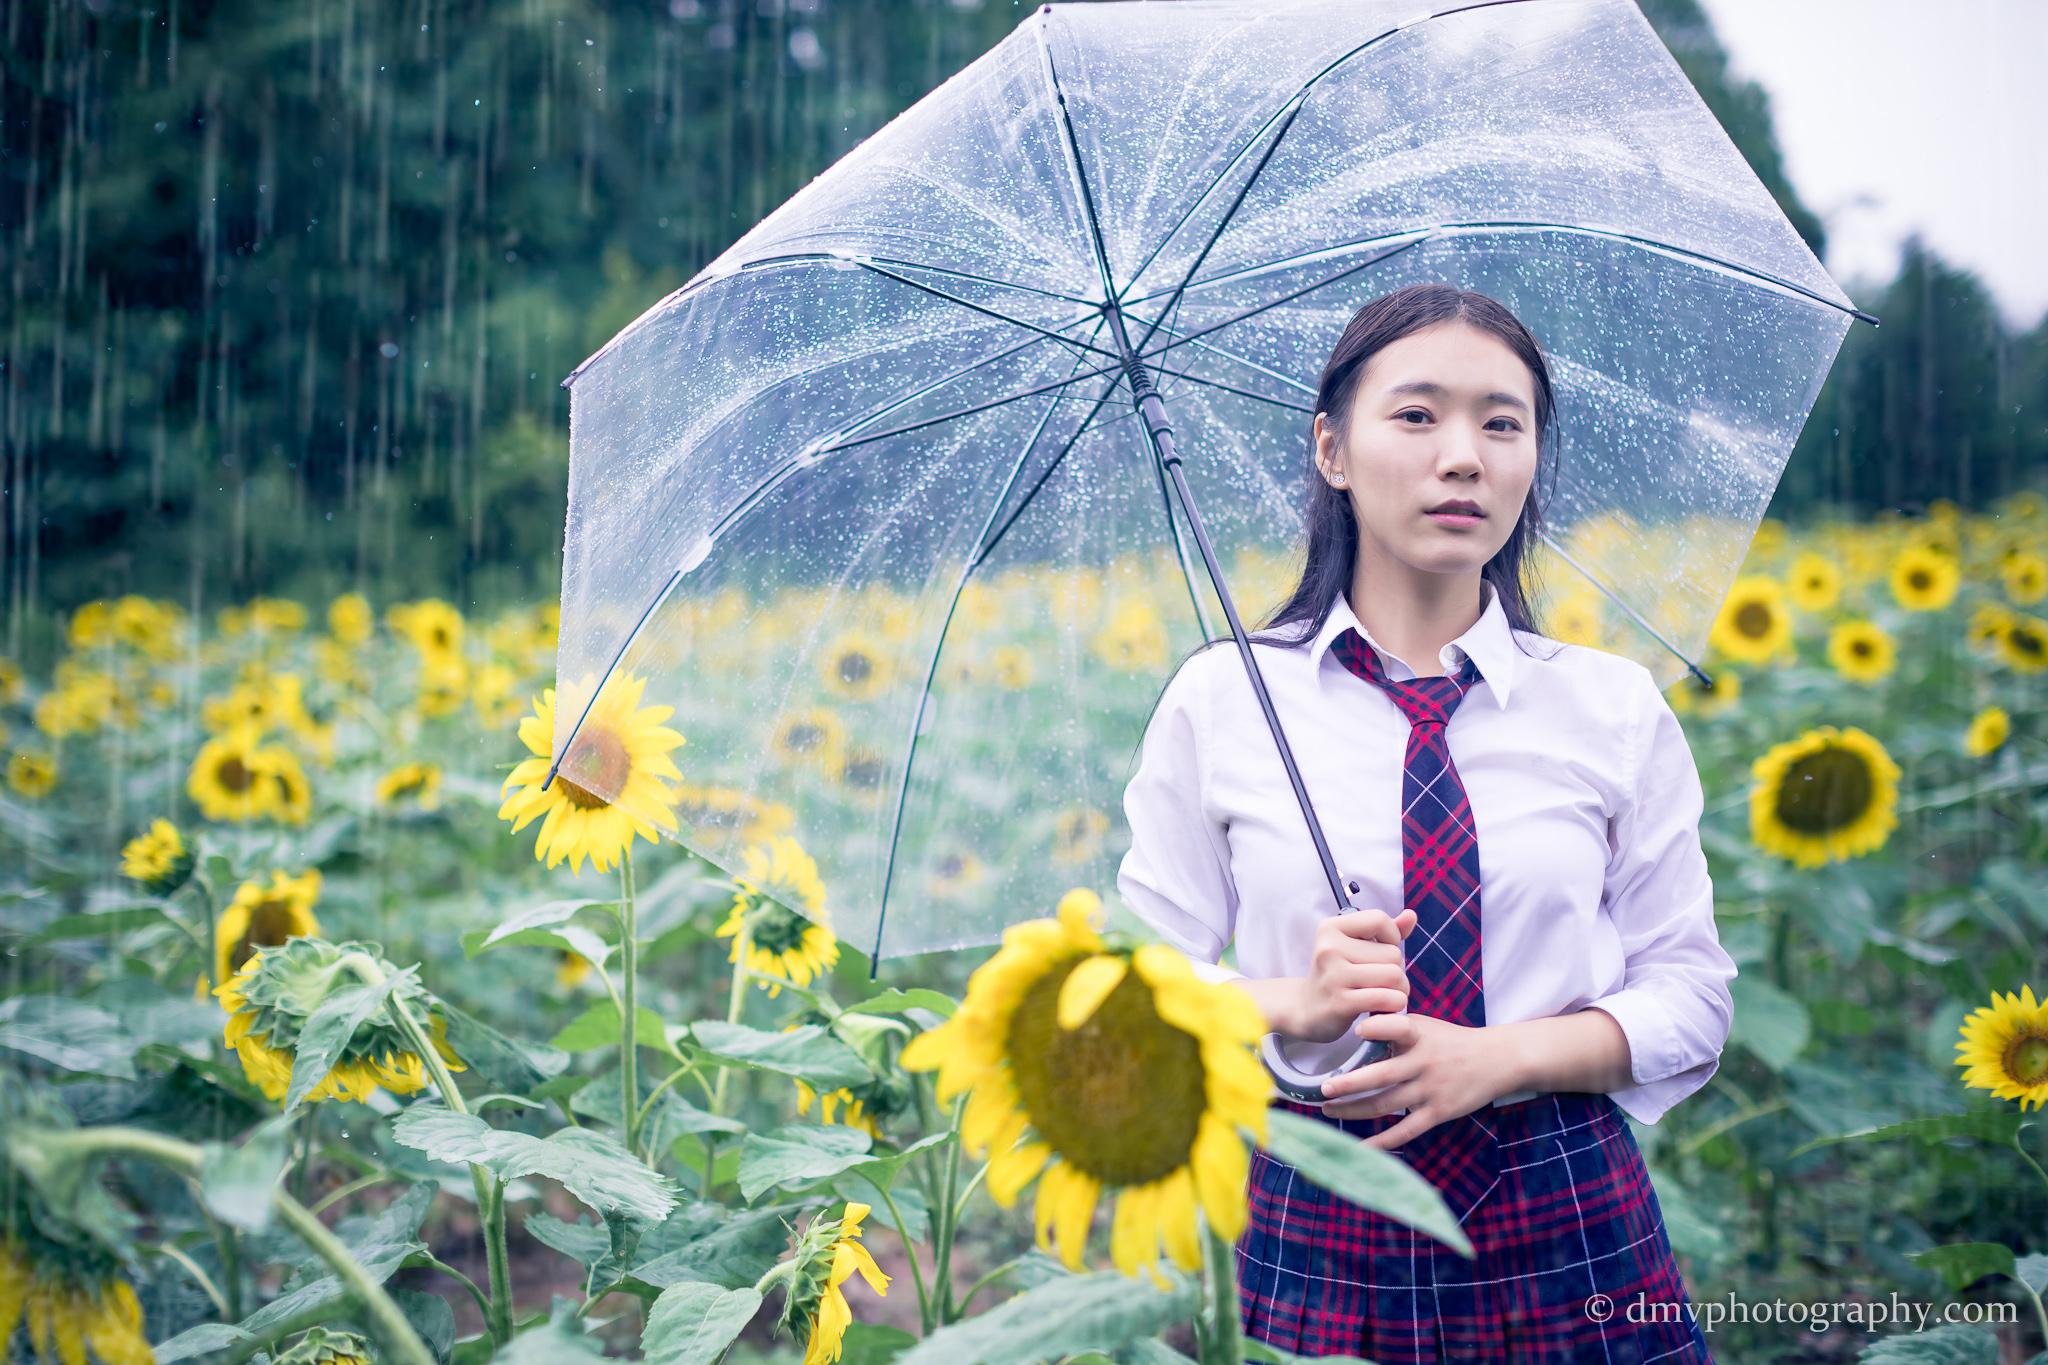 2017-07-29 - Yu Jie Sunflower - 00003